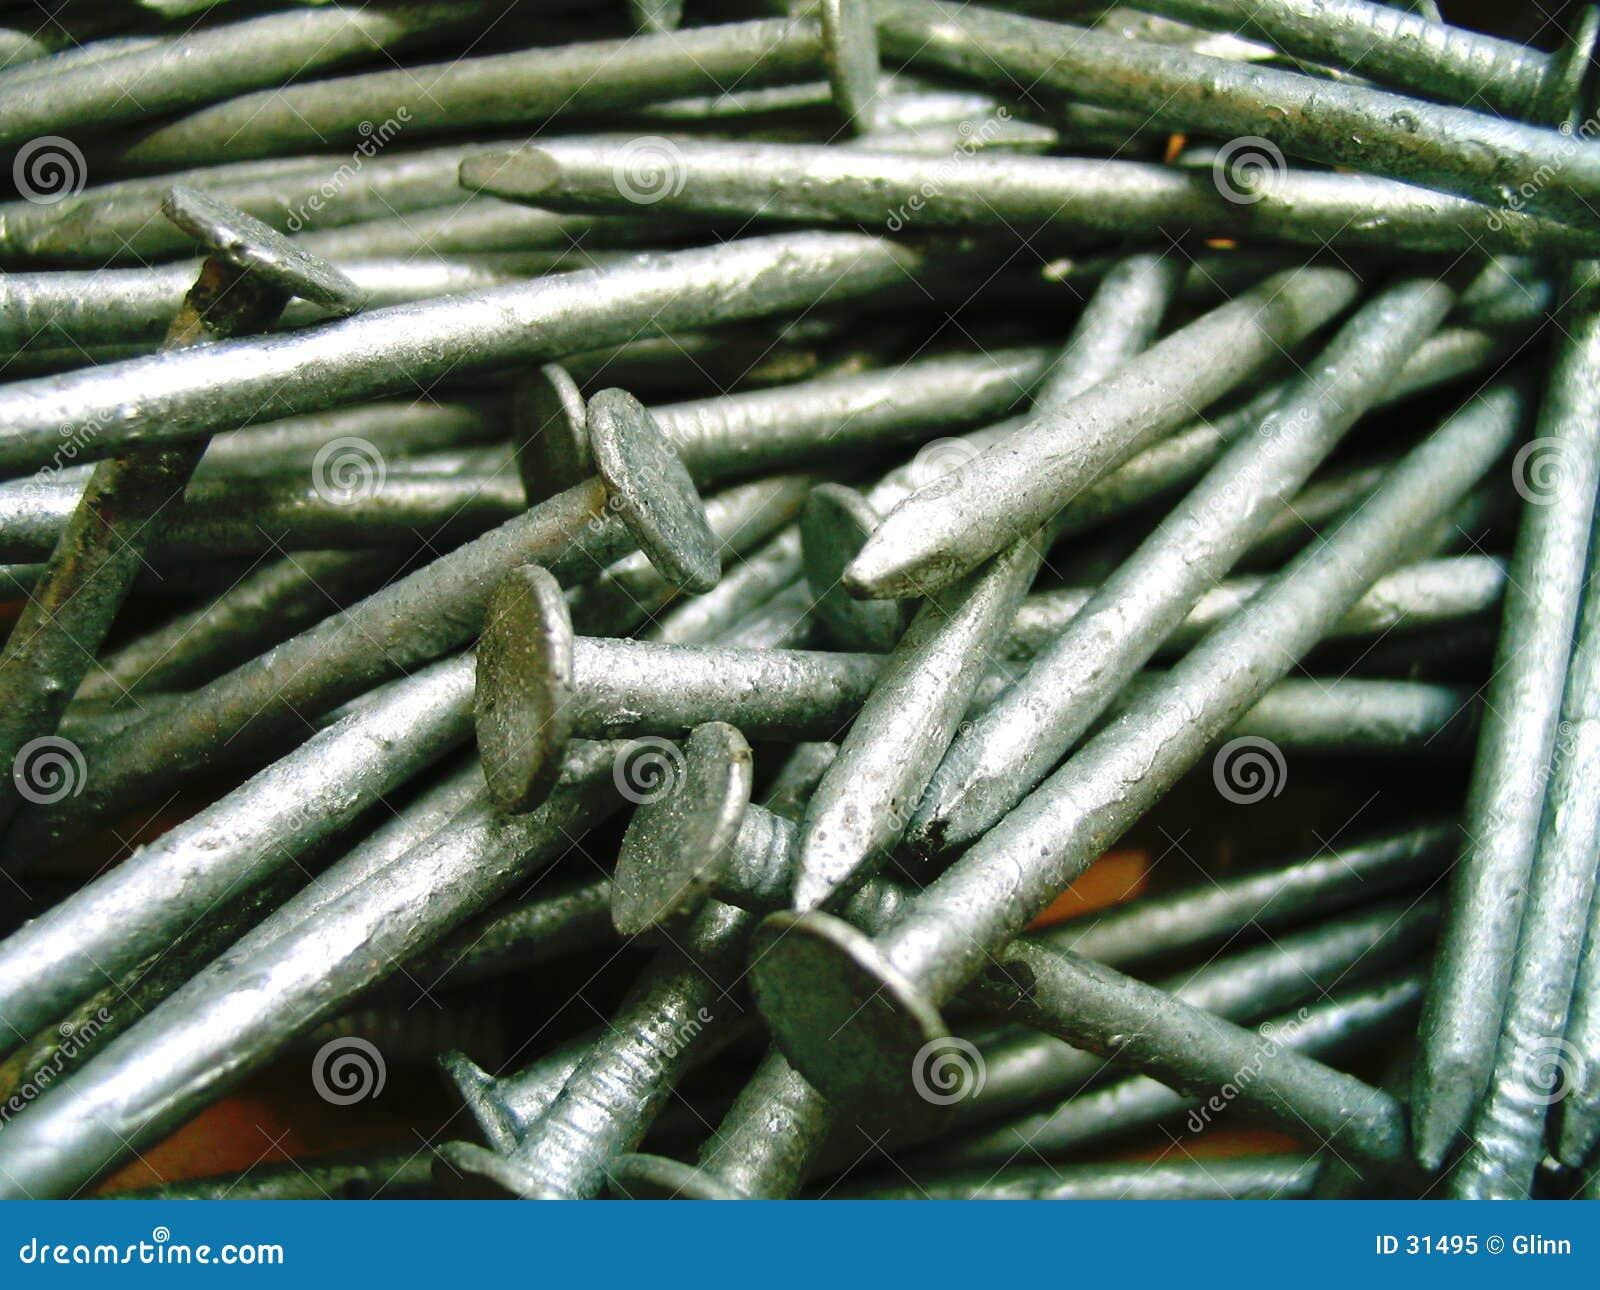 Construction nails